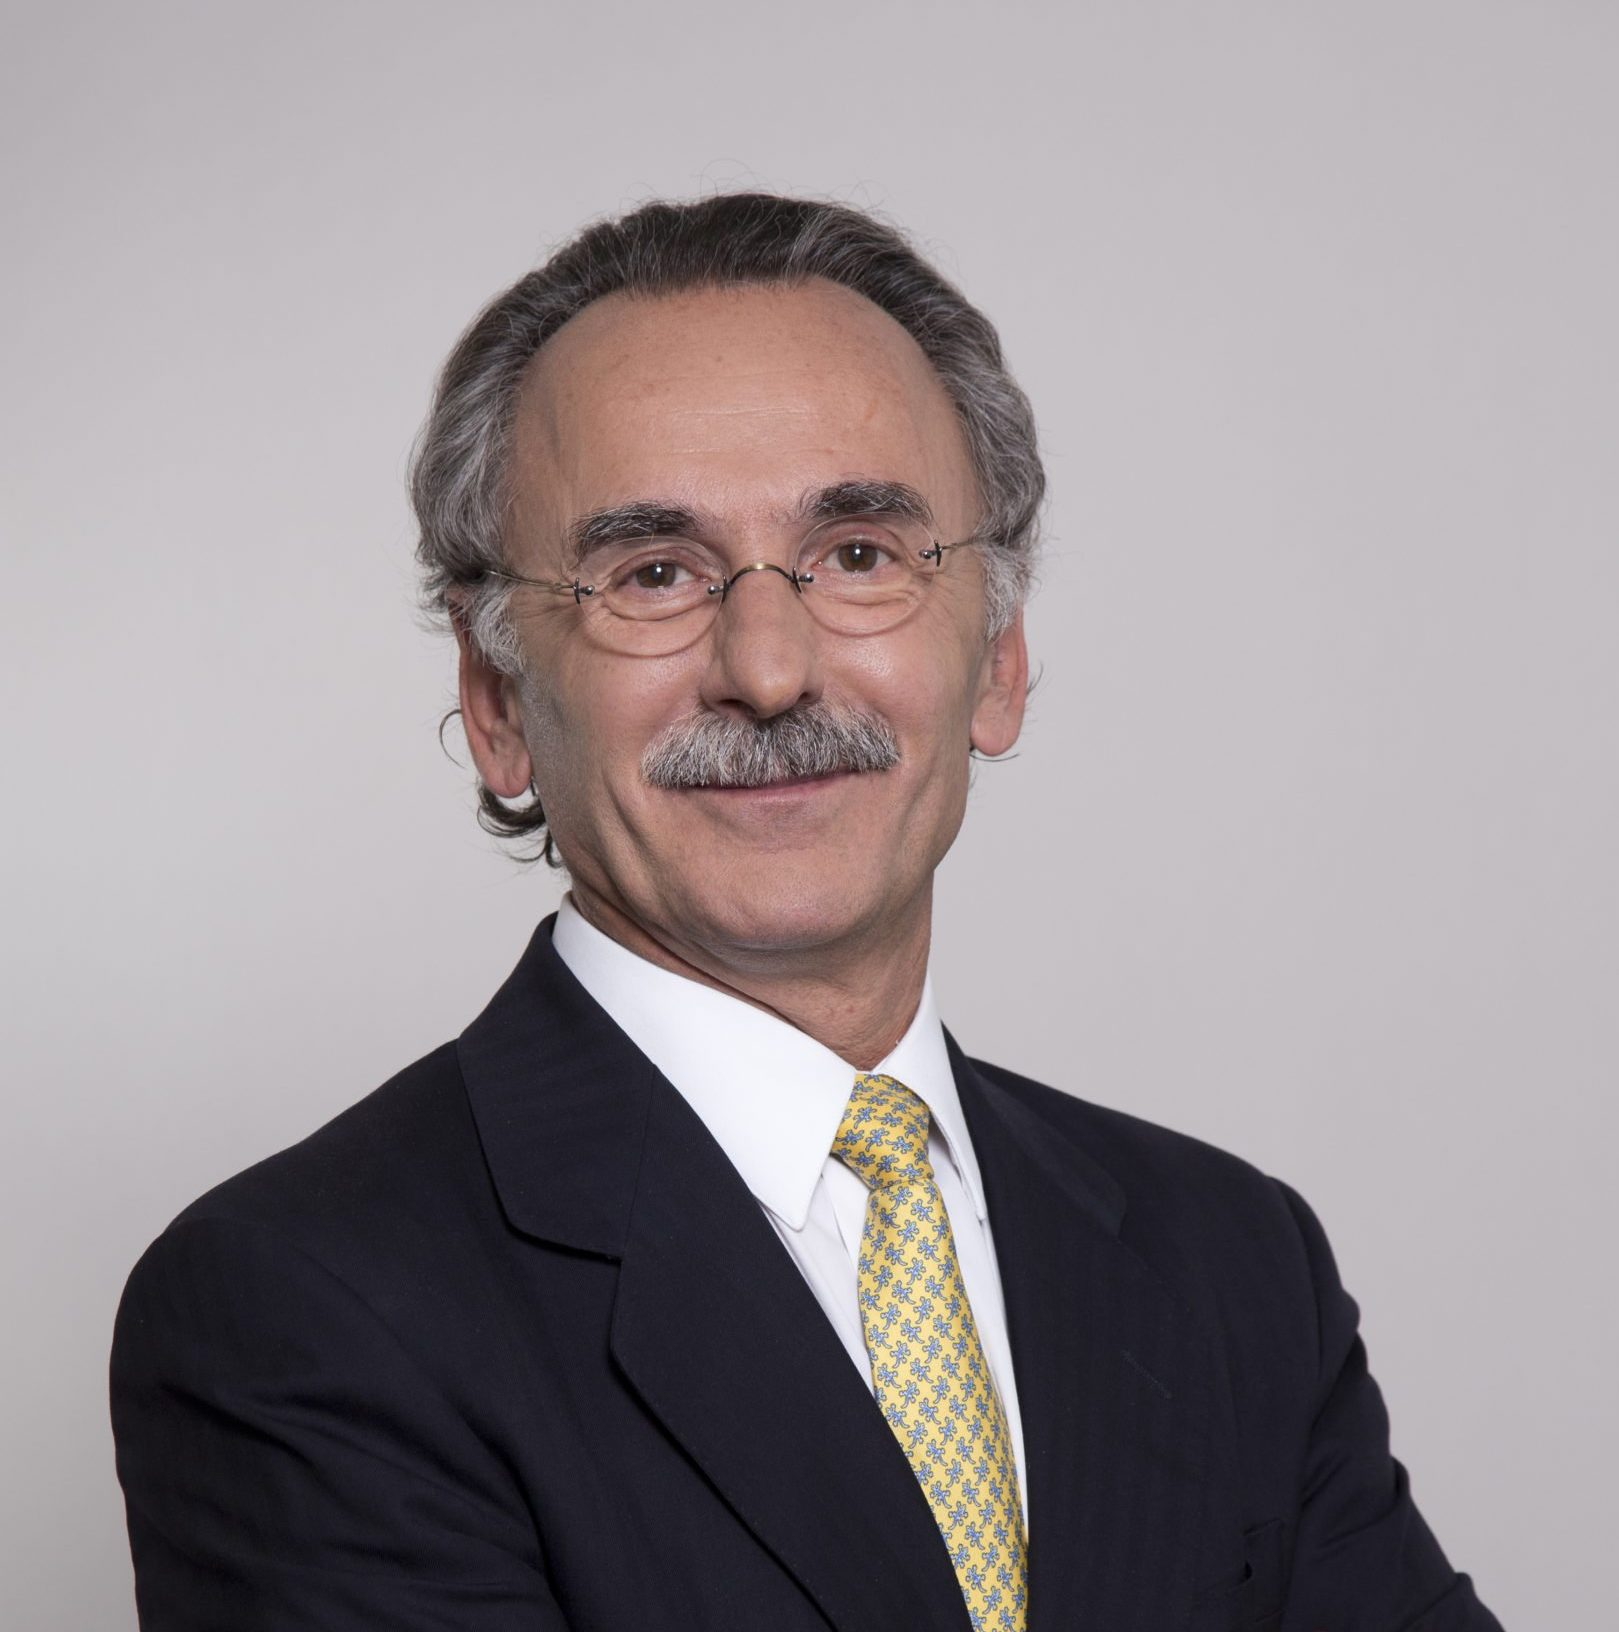 Luis Furnells